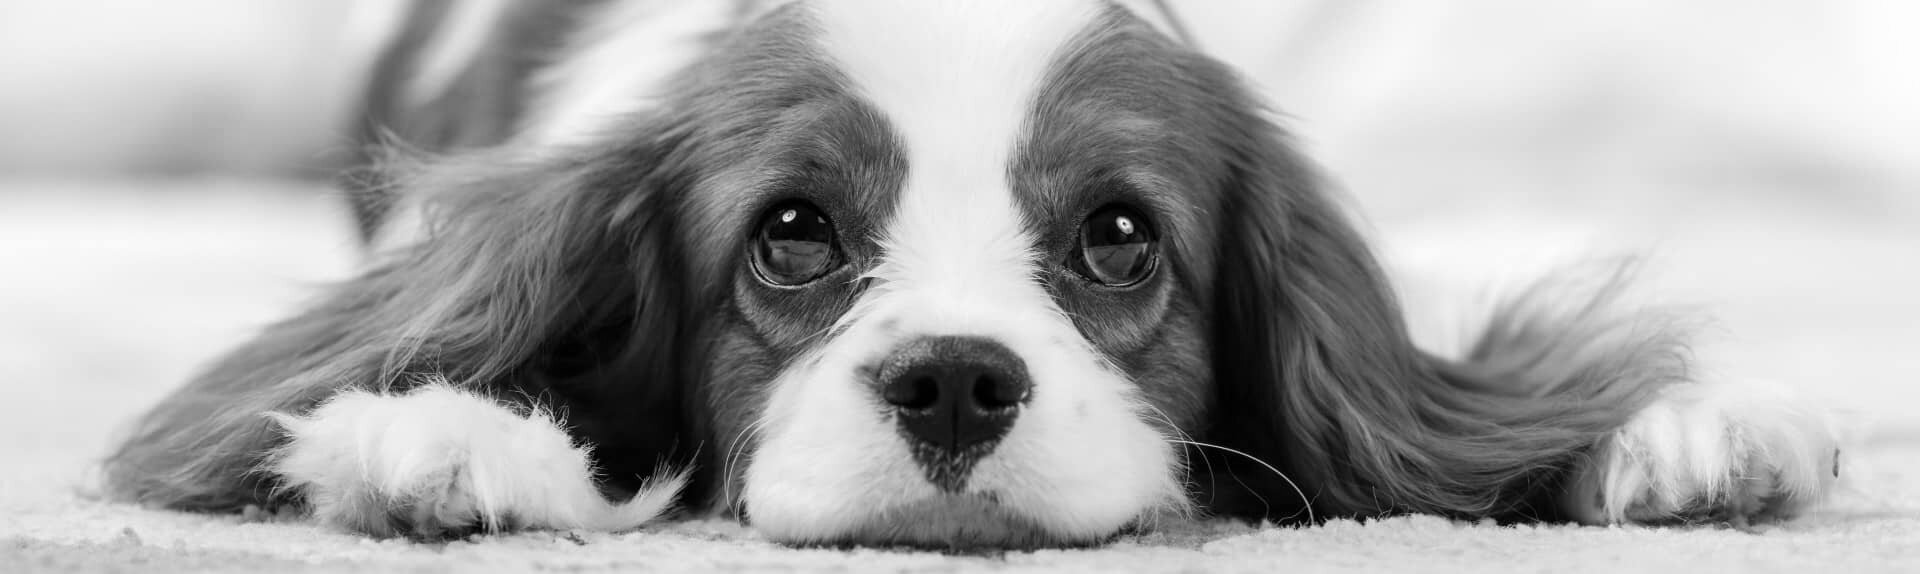 FAQ Dharma Dog Grooming services